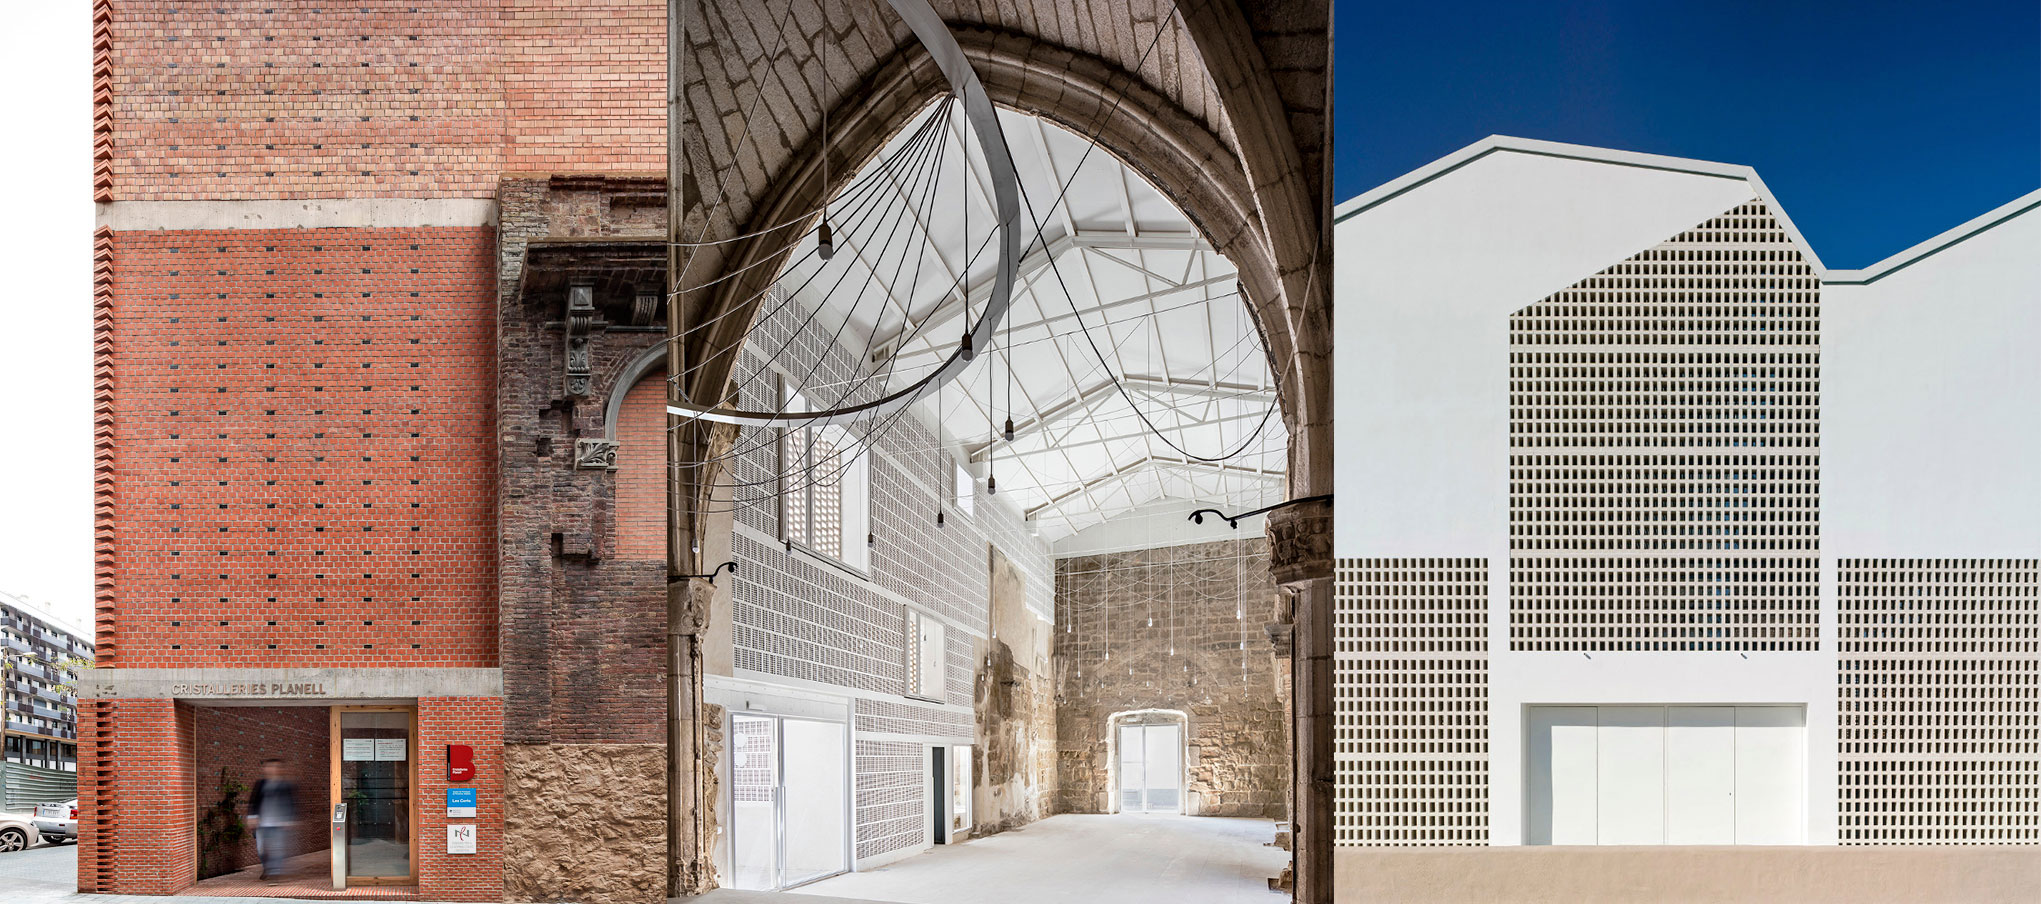 Winners three works ex aequo, Sports Centre Es Puig D´en Valls (Balearic Islands), Rehabilitation of the The Ancient Church of Vilanova de la Barca (Lleida) and the recovery of the Lleialtat Santseca building (Barcelona)